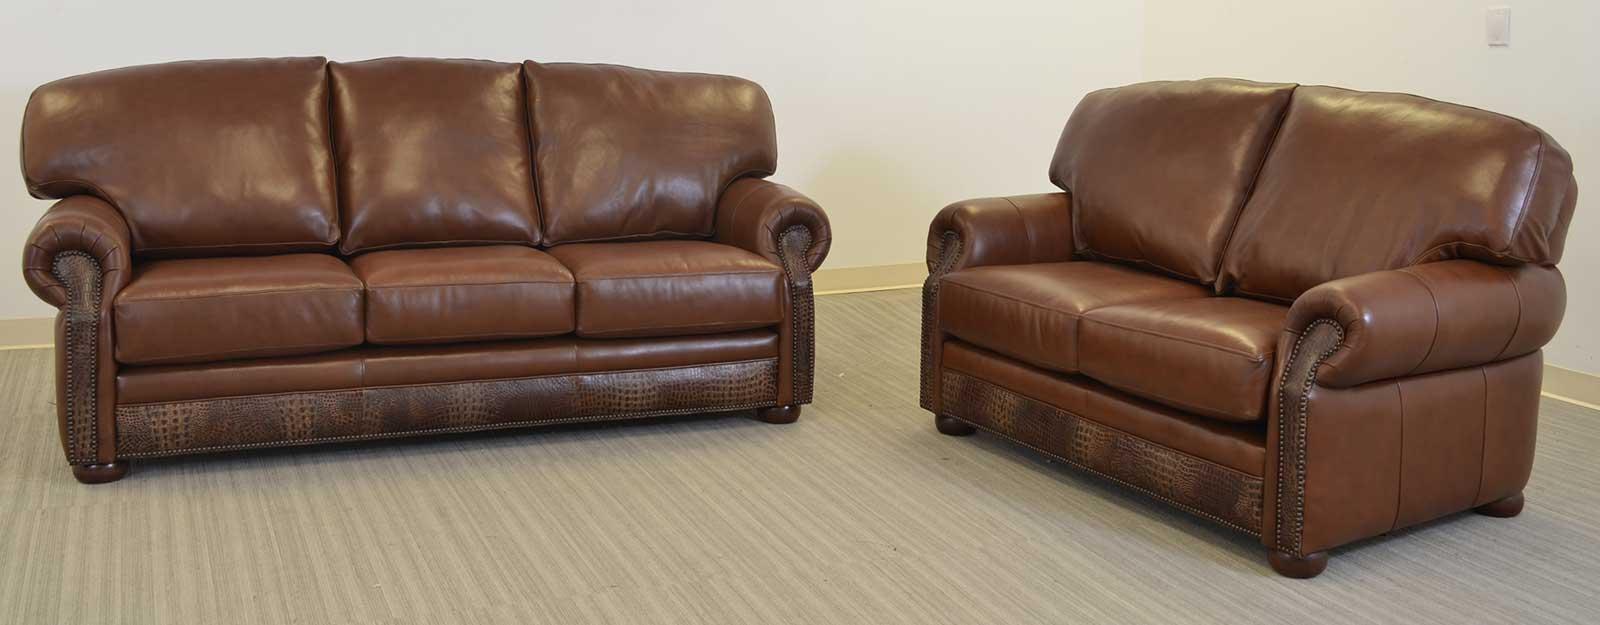 Chicago Sofa The Leather Sofa Company ~ All Leather Sofa And Loveseat